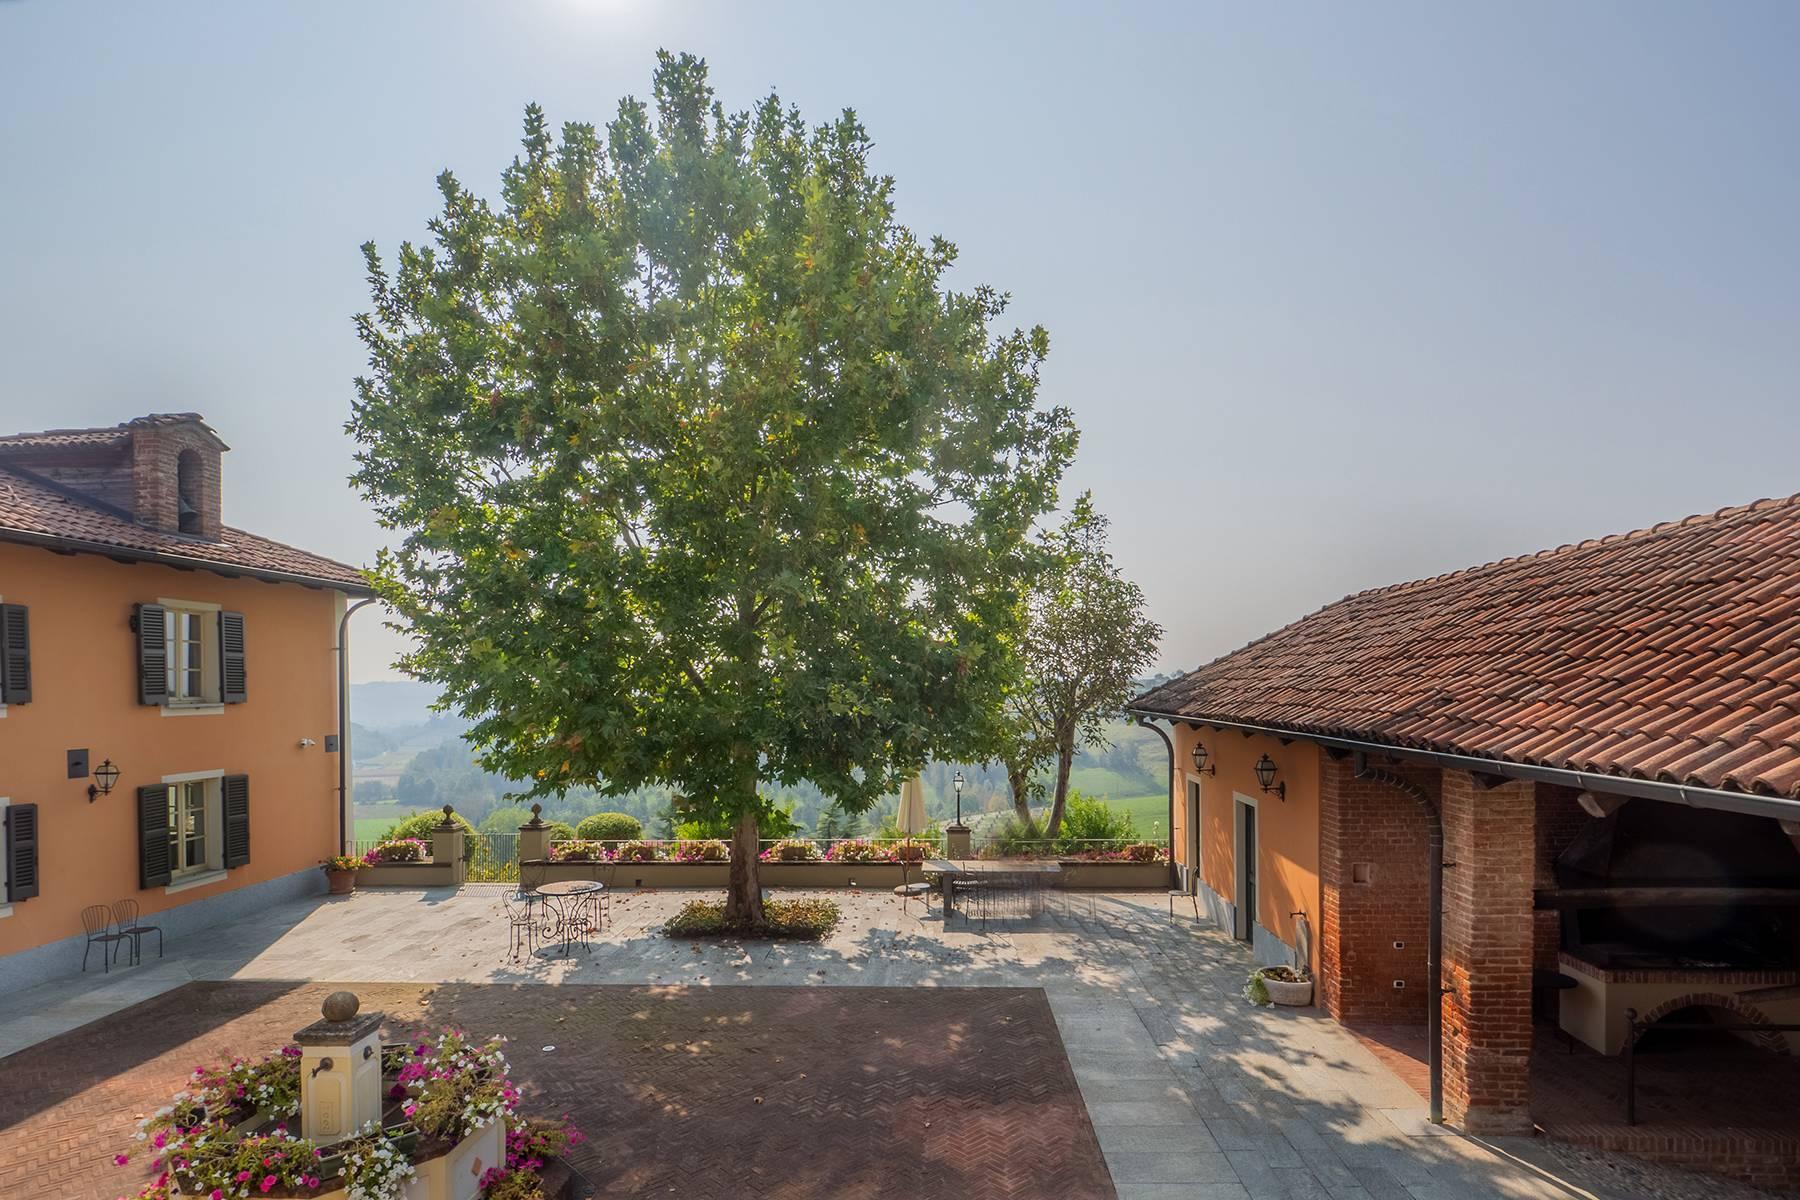 Prestigious estate with breathtaking views of the Alps - 50